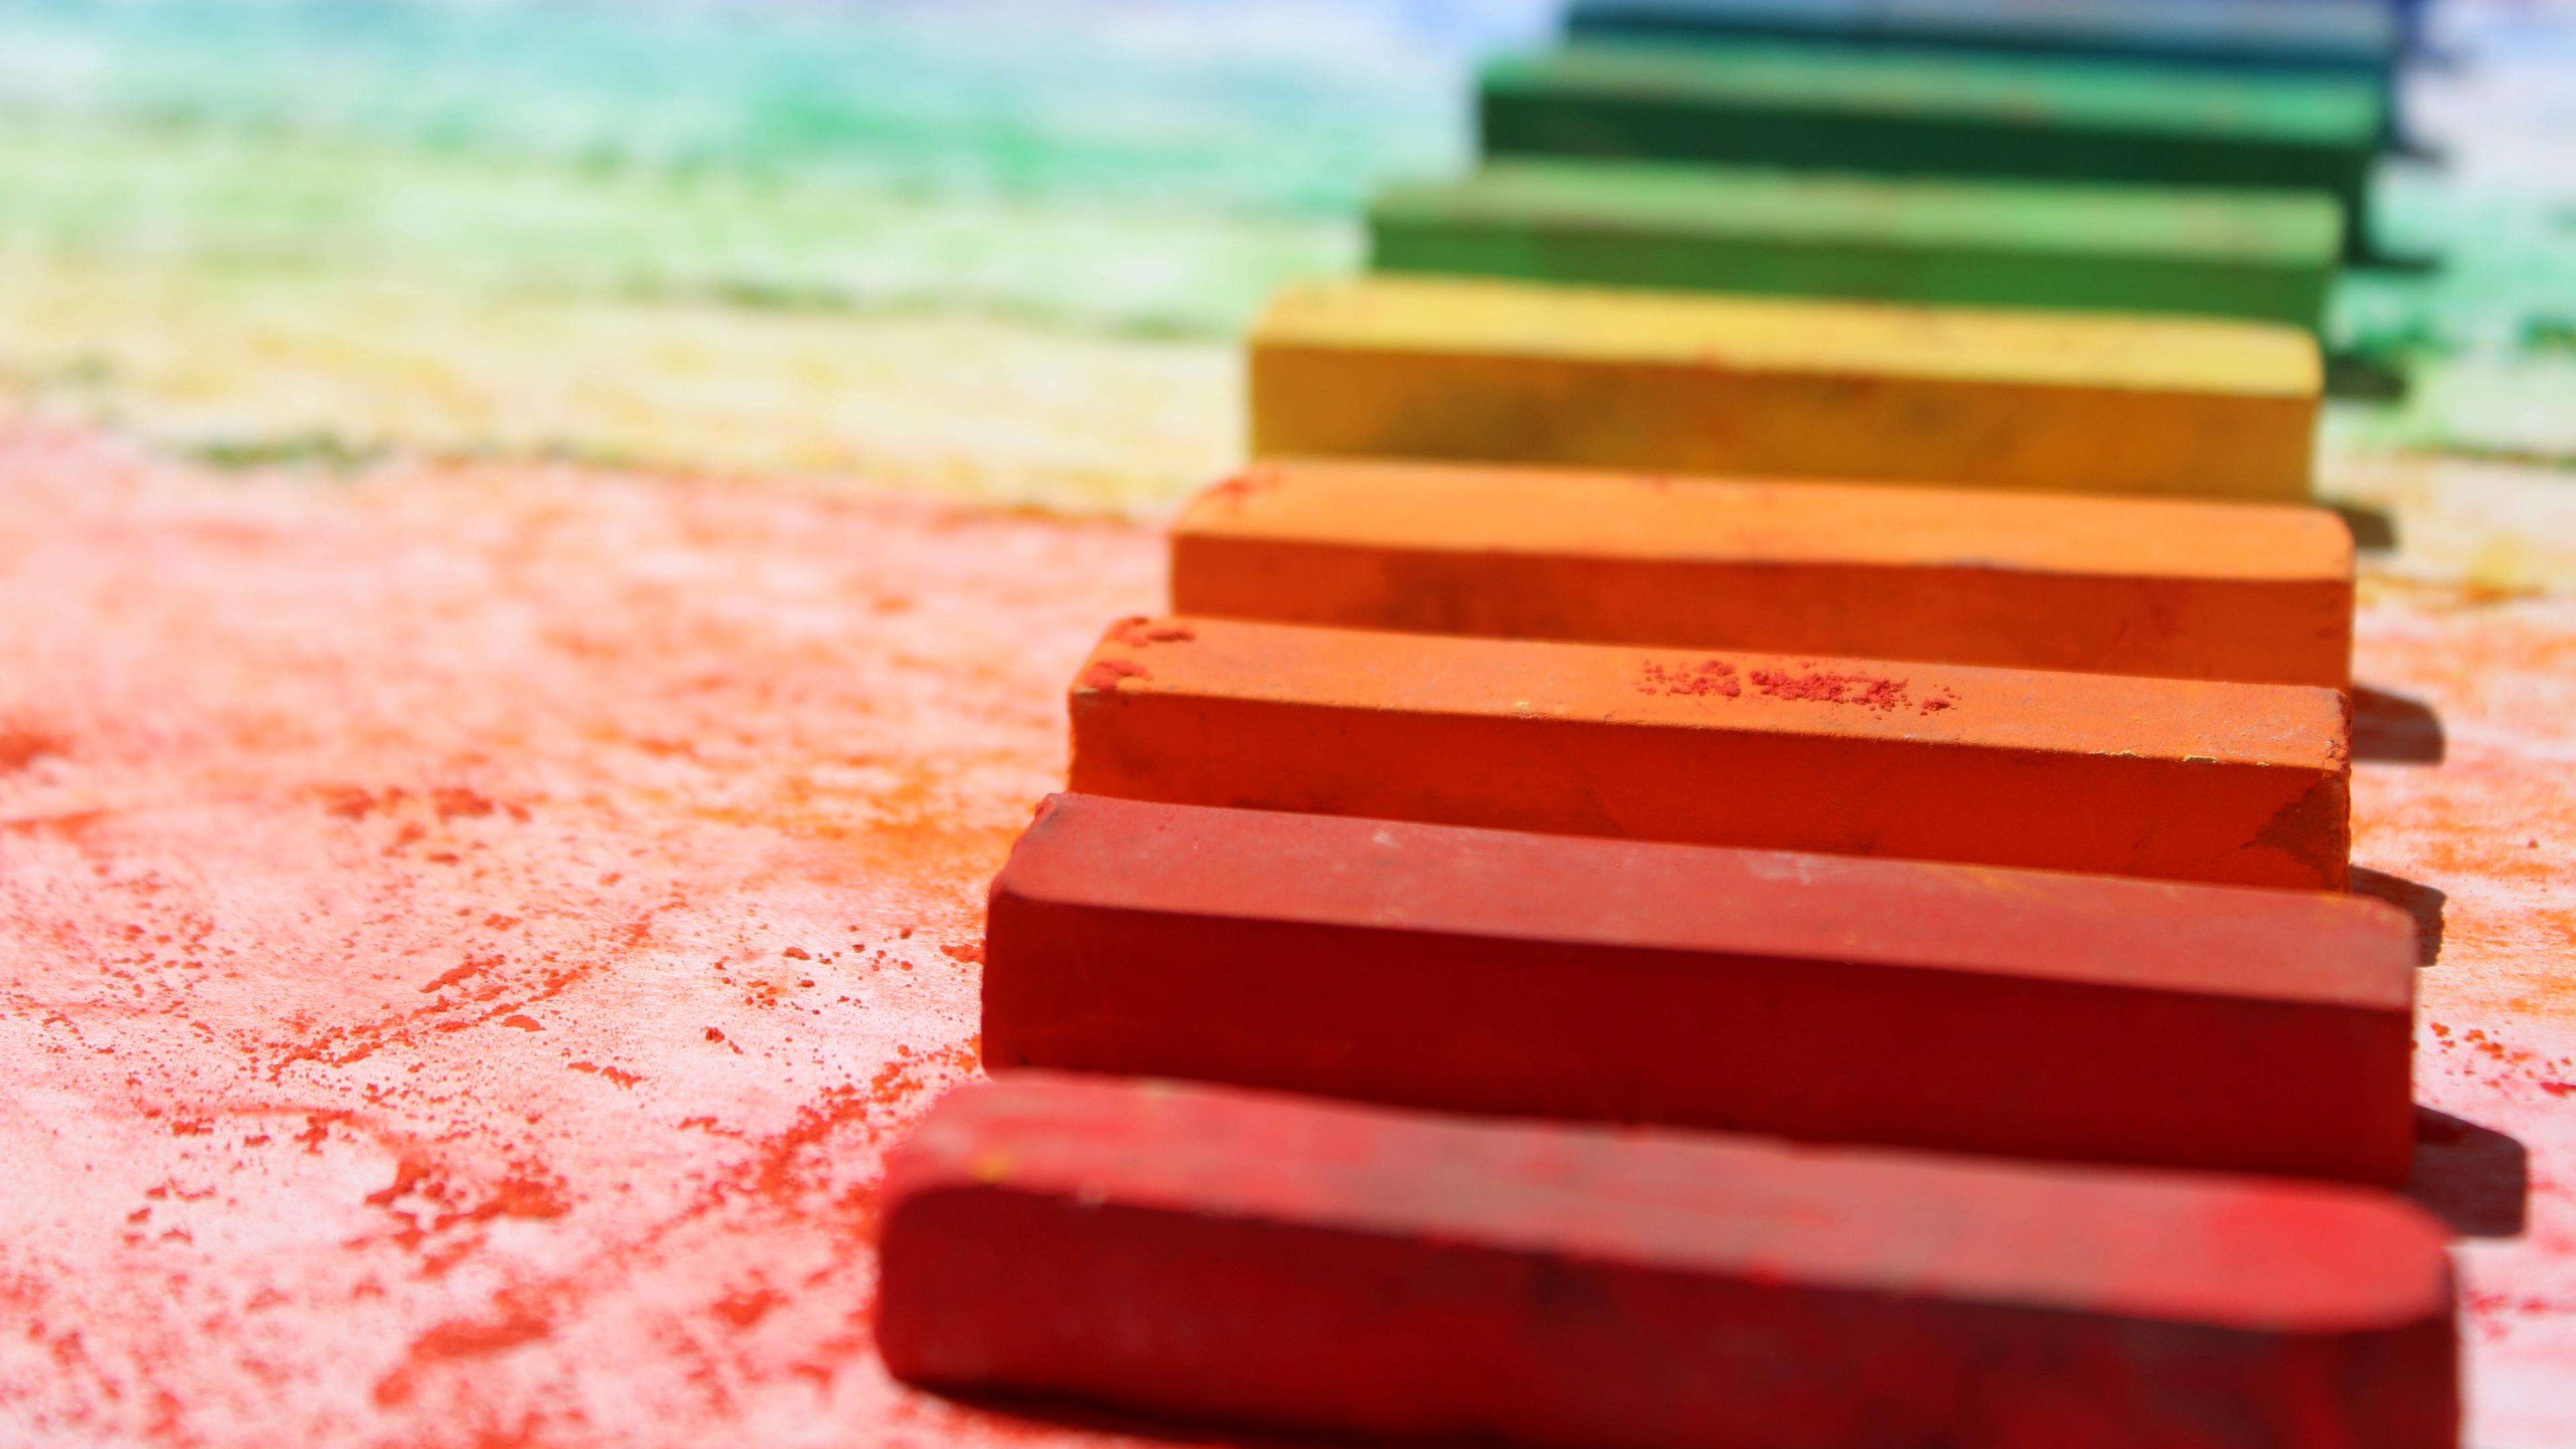 Wallpaper Pastel, Color, Pencils, Chalk - Background Colorful Pastel Hd - HD Wallpaper